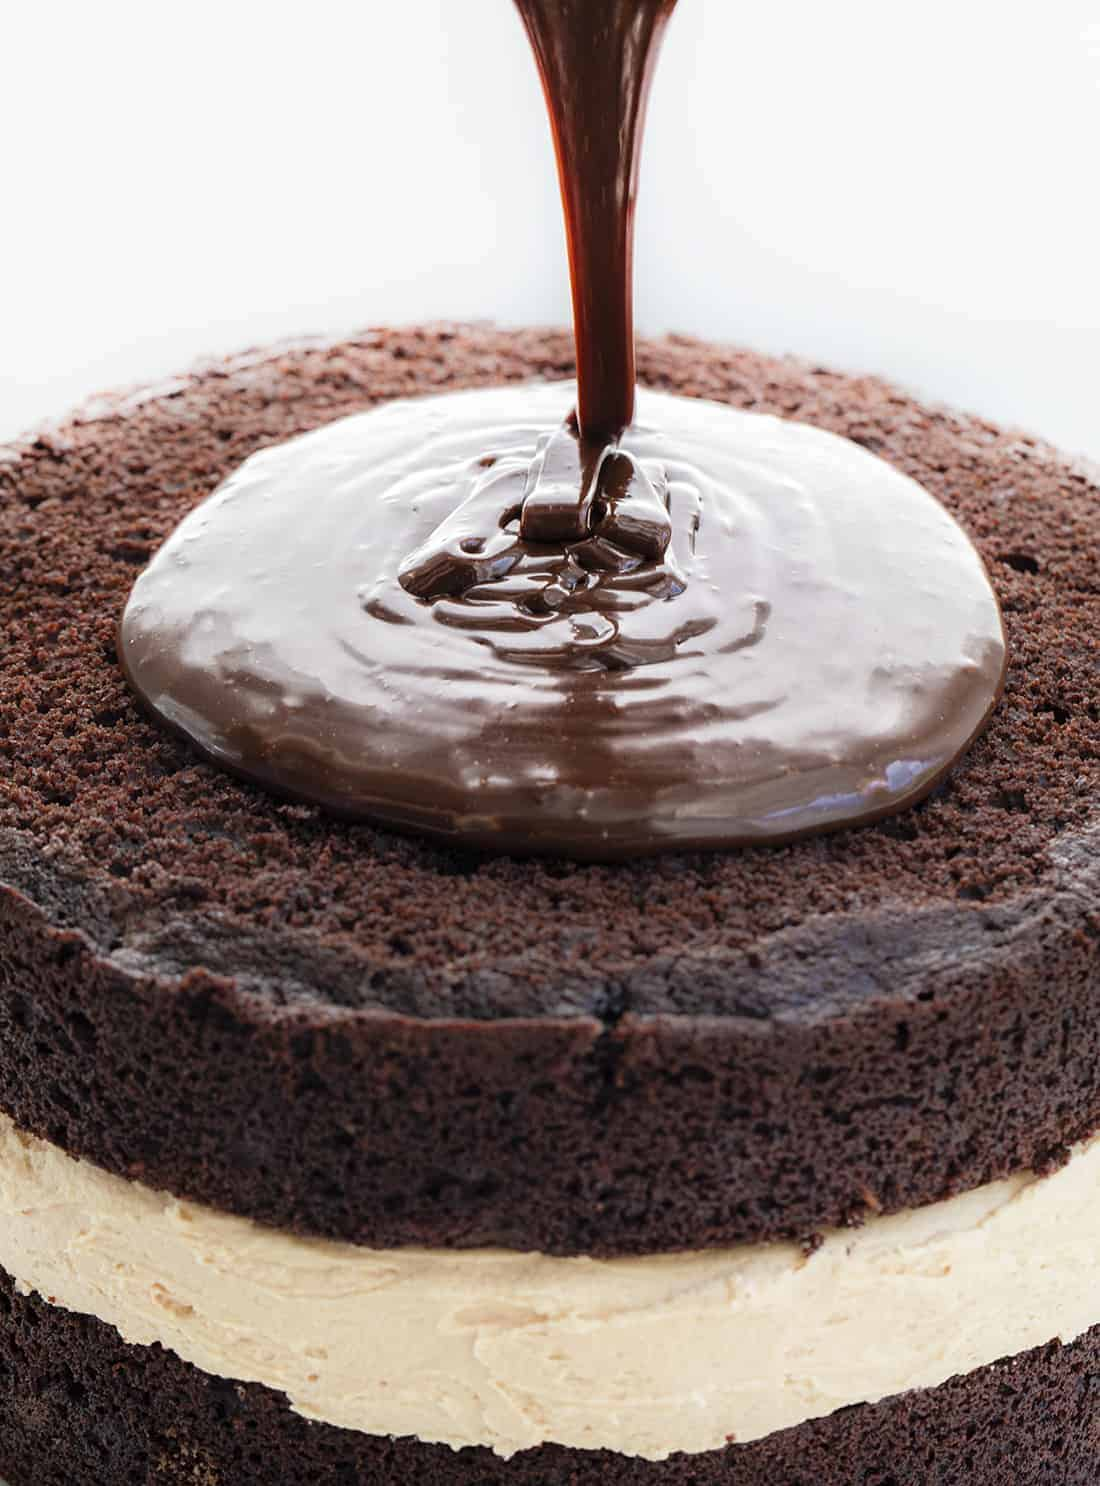 Adding Ganache to Biscoff Buckeye Cake